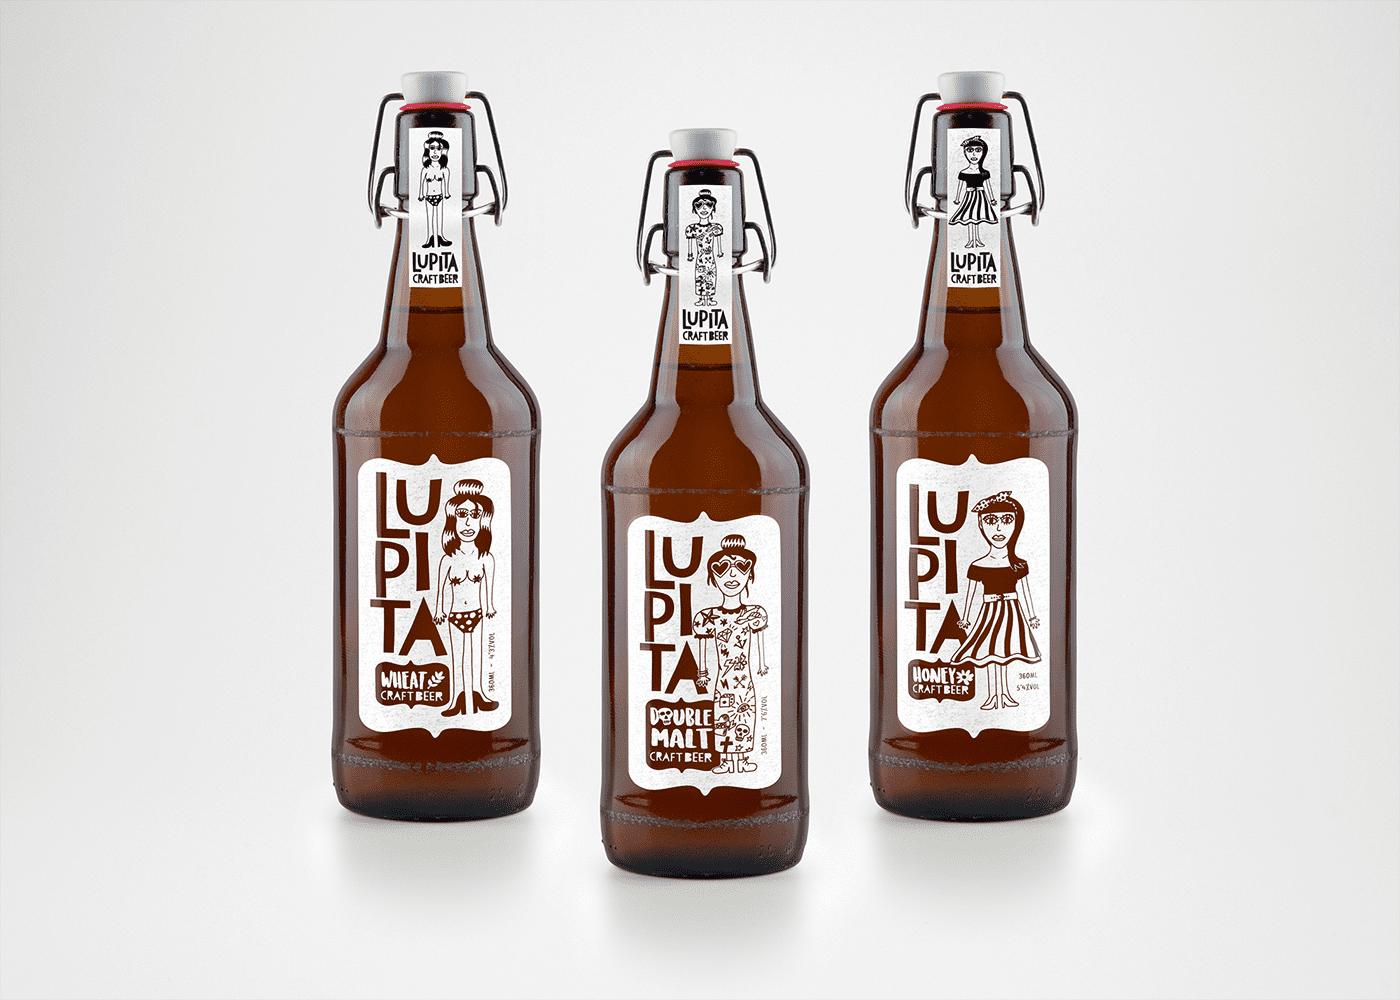 этикетка на пиво